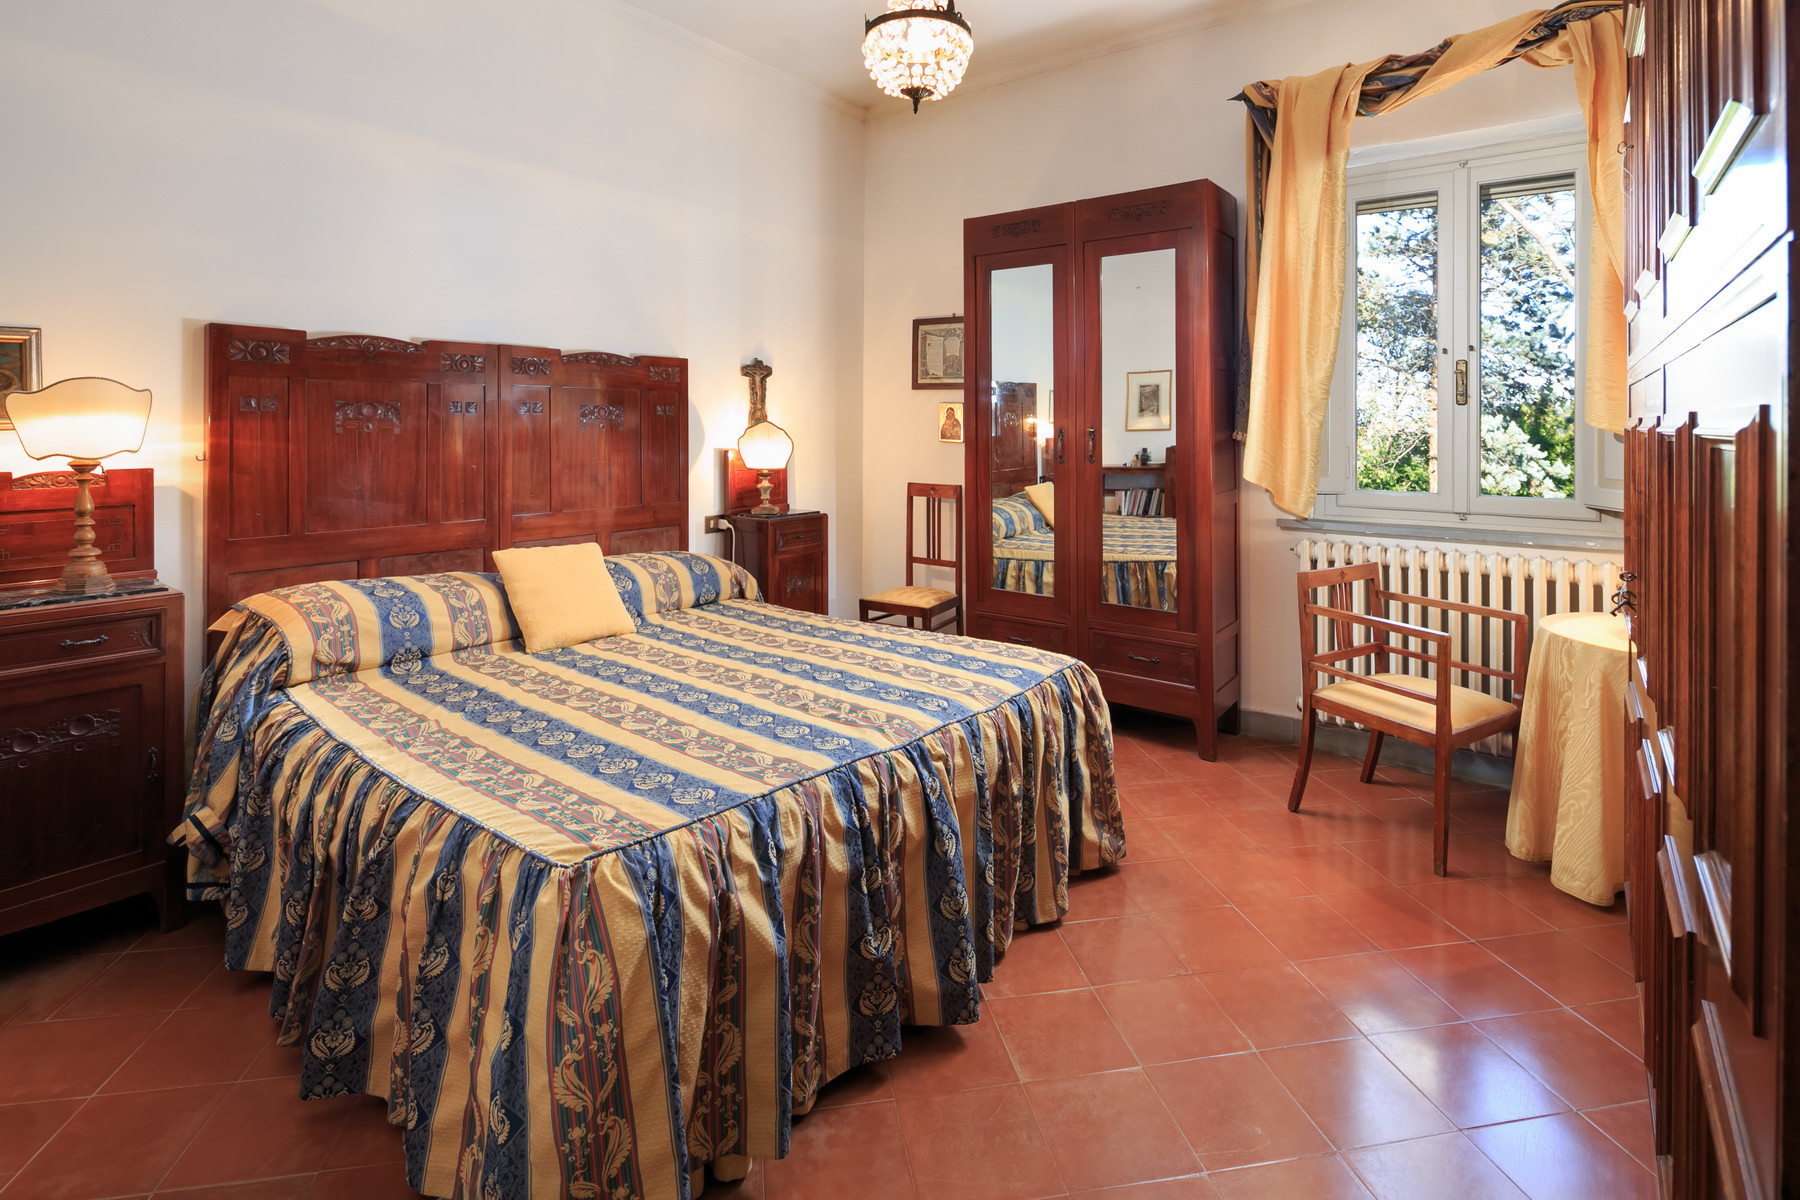 Villa in Vendita a Casciana Terme Lari: 5 locali, 550 mq - Foto 11